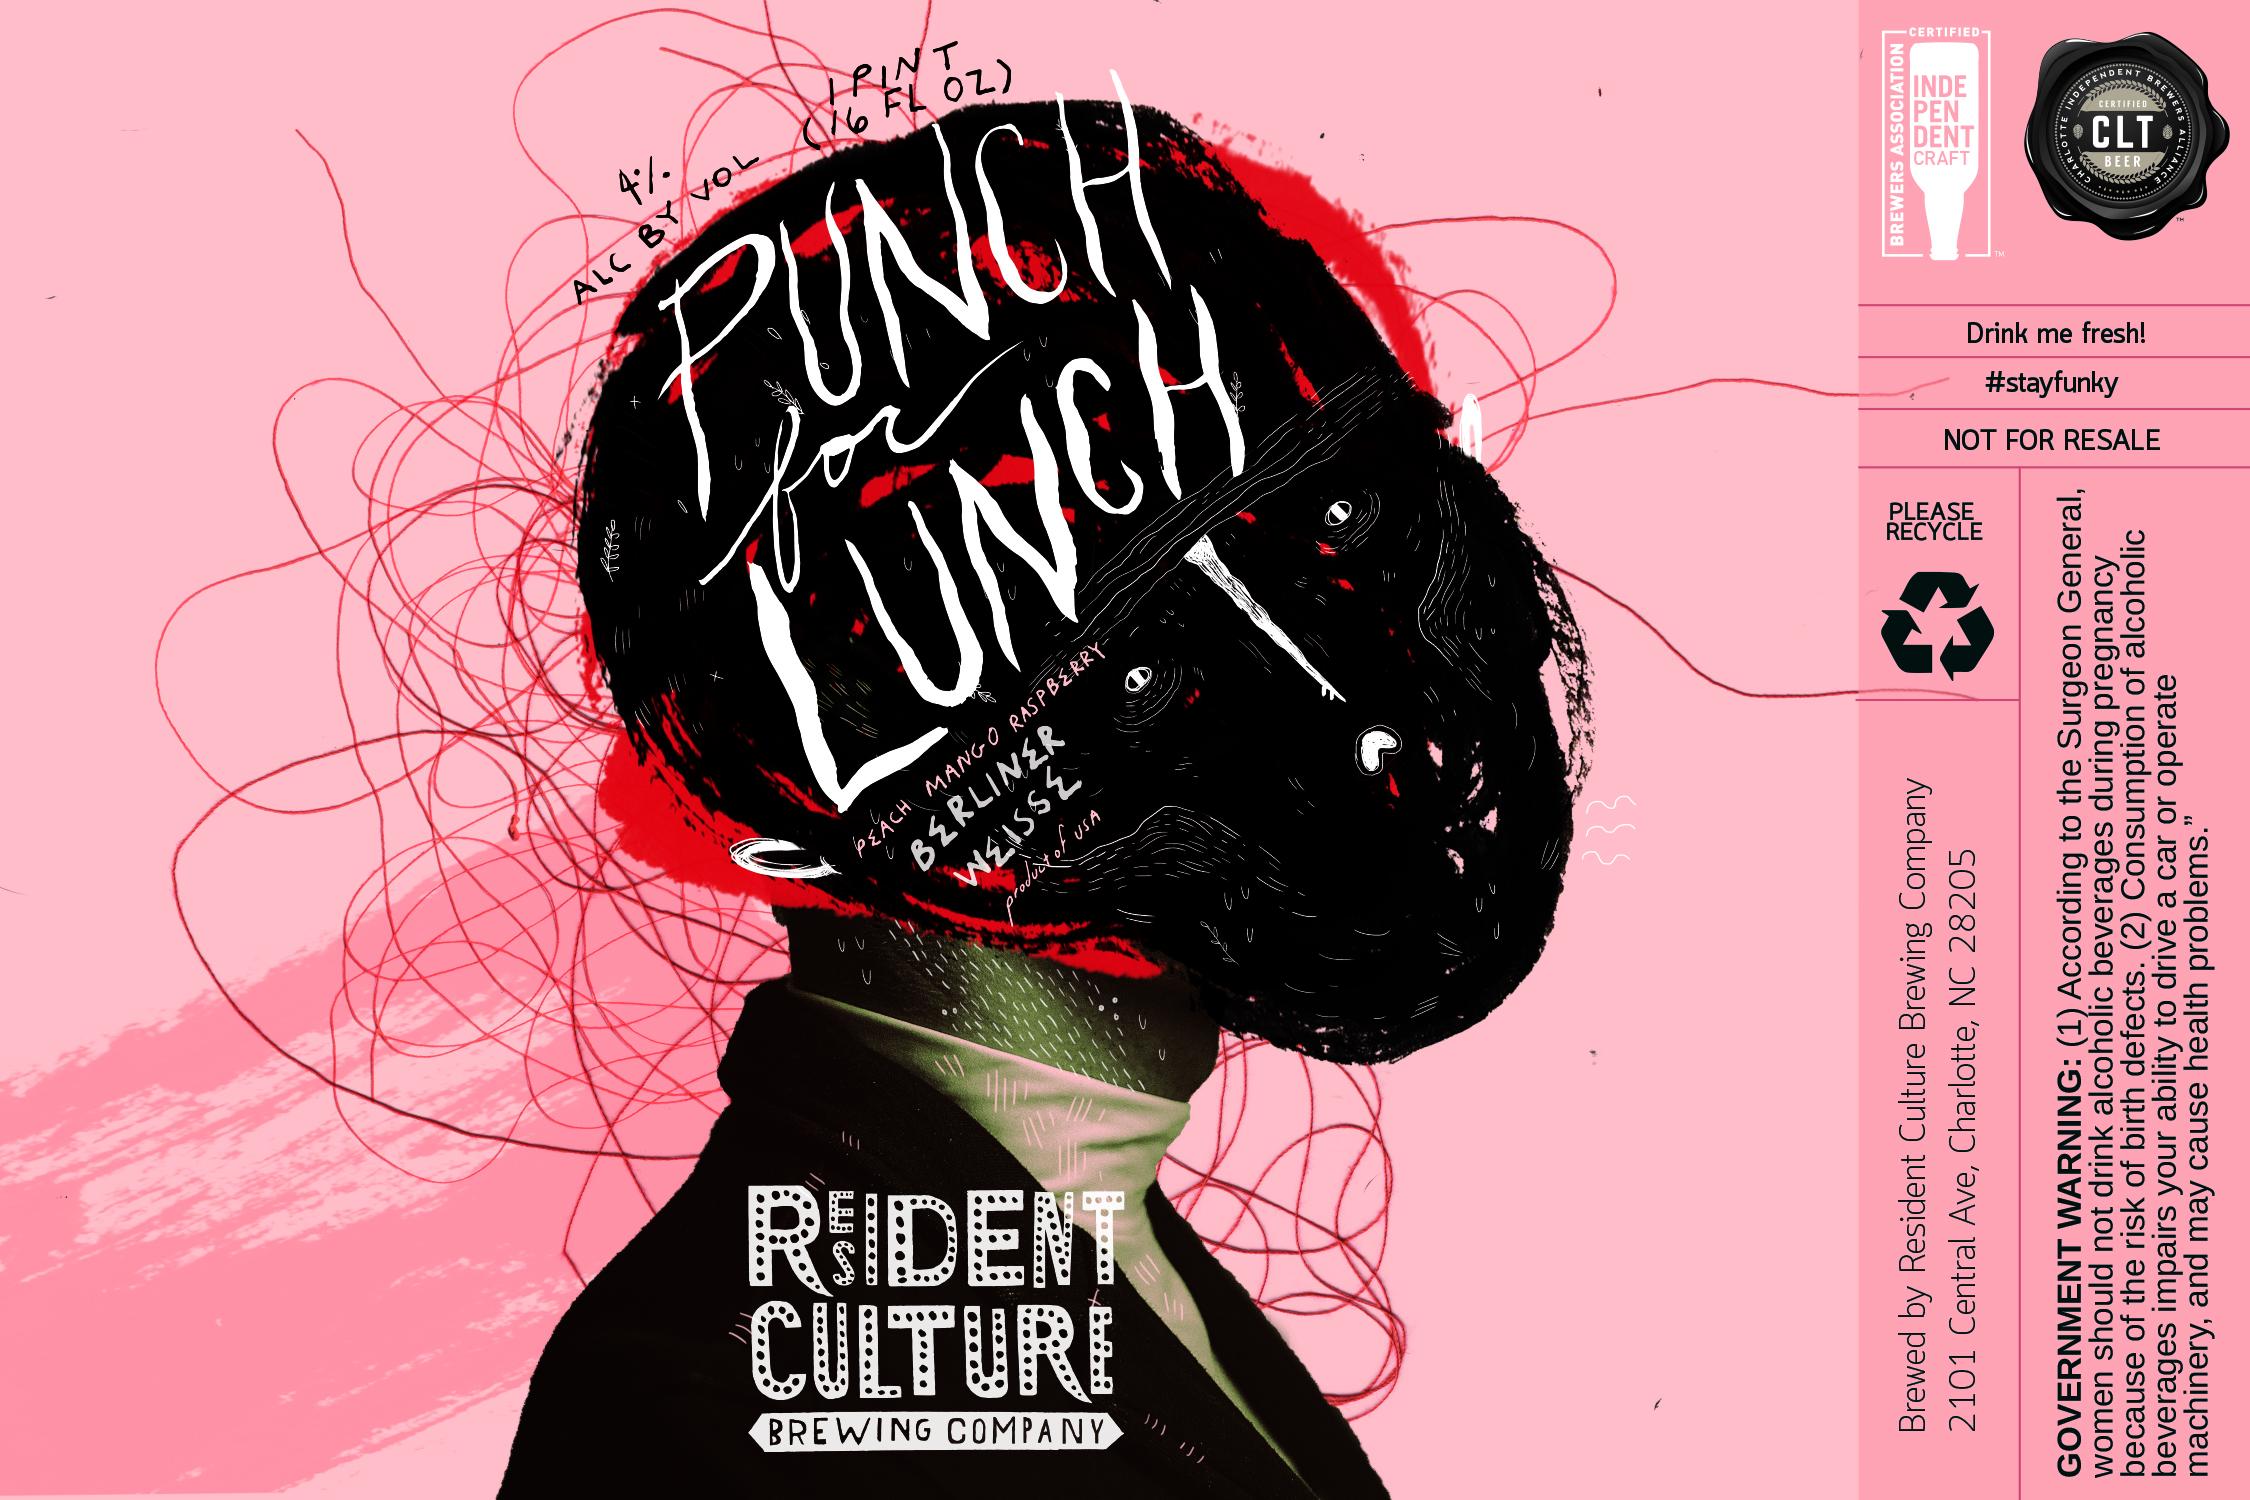 RC_PunchforLunch_Label_7.5x5.jpg